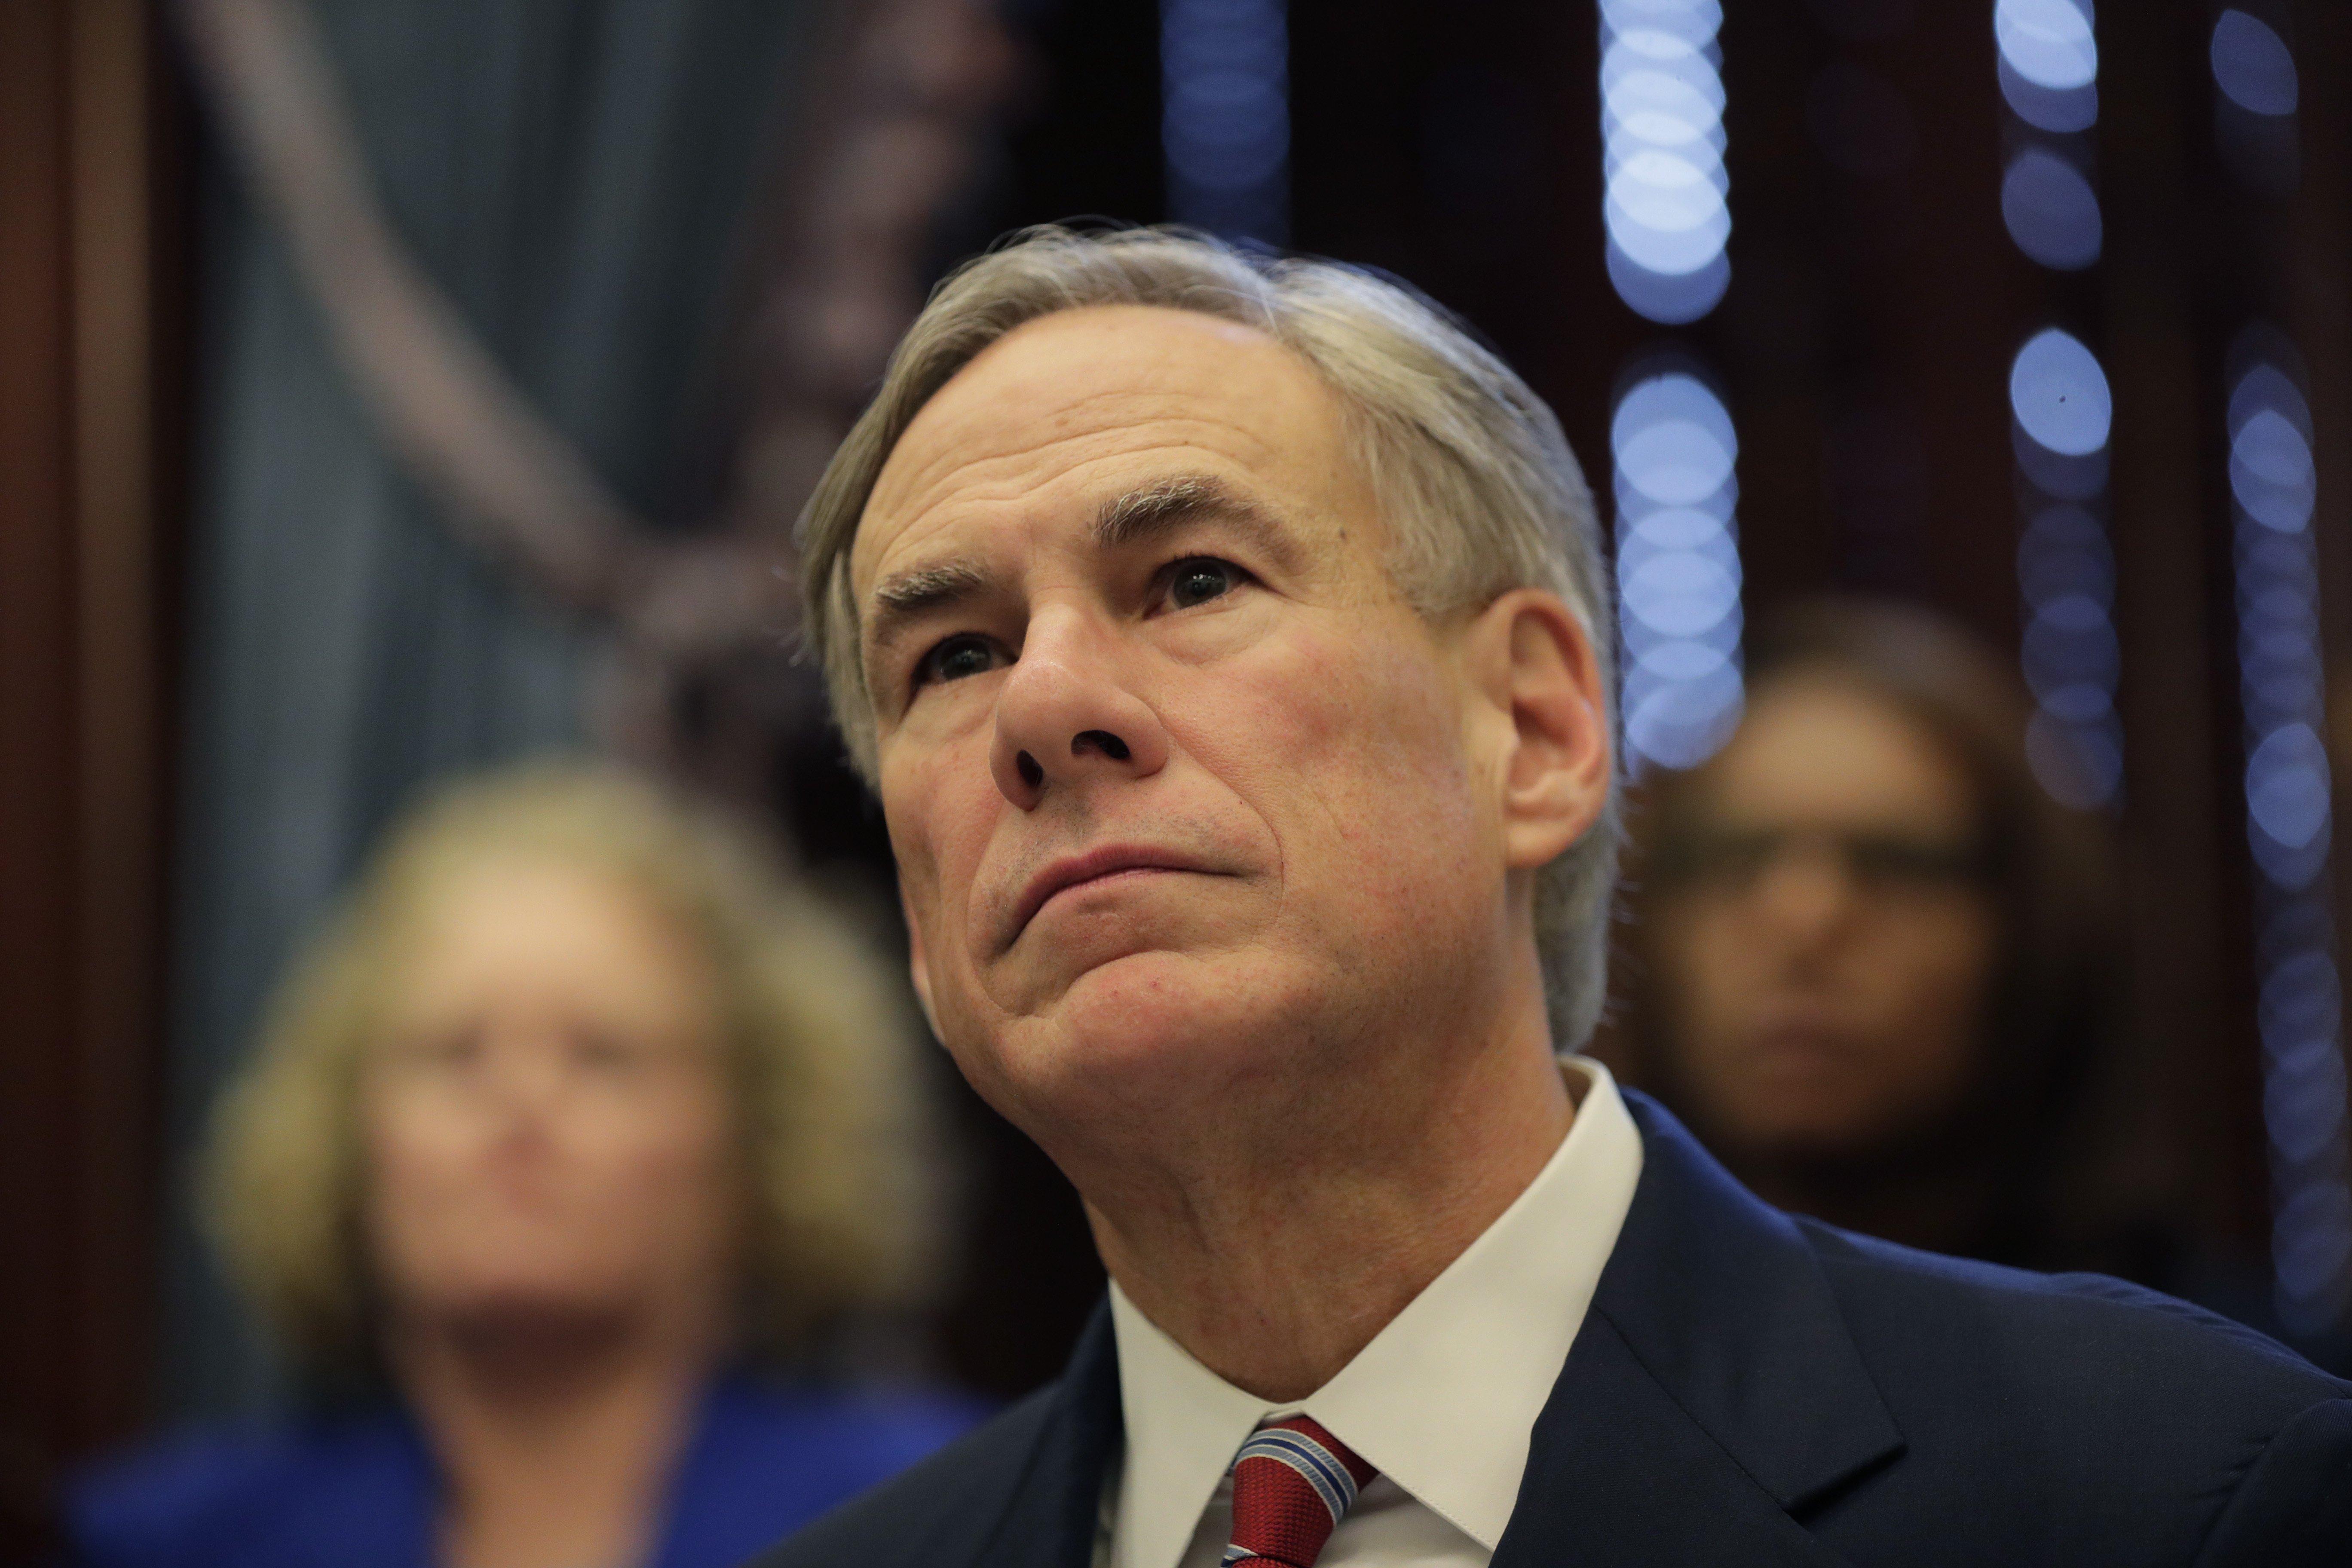 Texas district makes masks part of dress code to get around Abbott's order